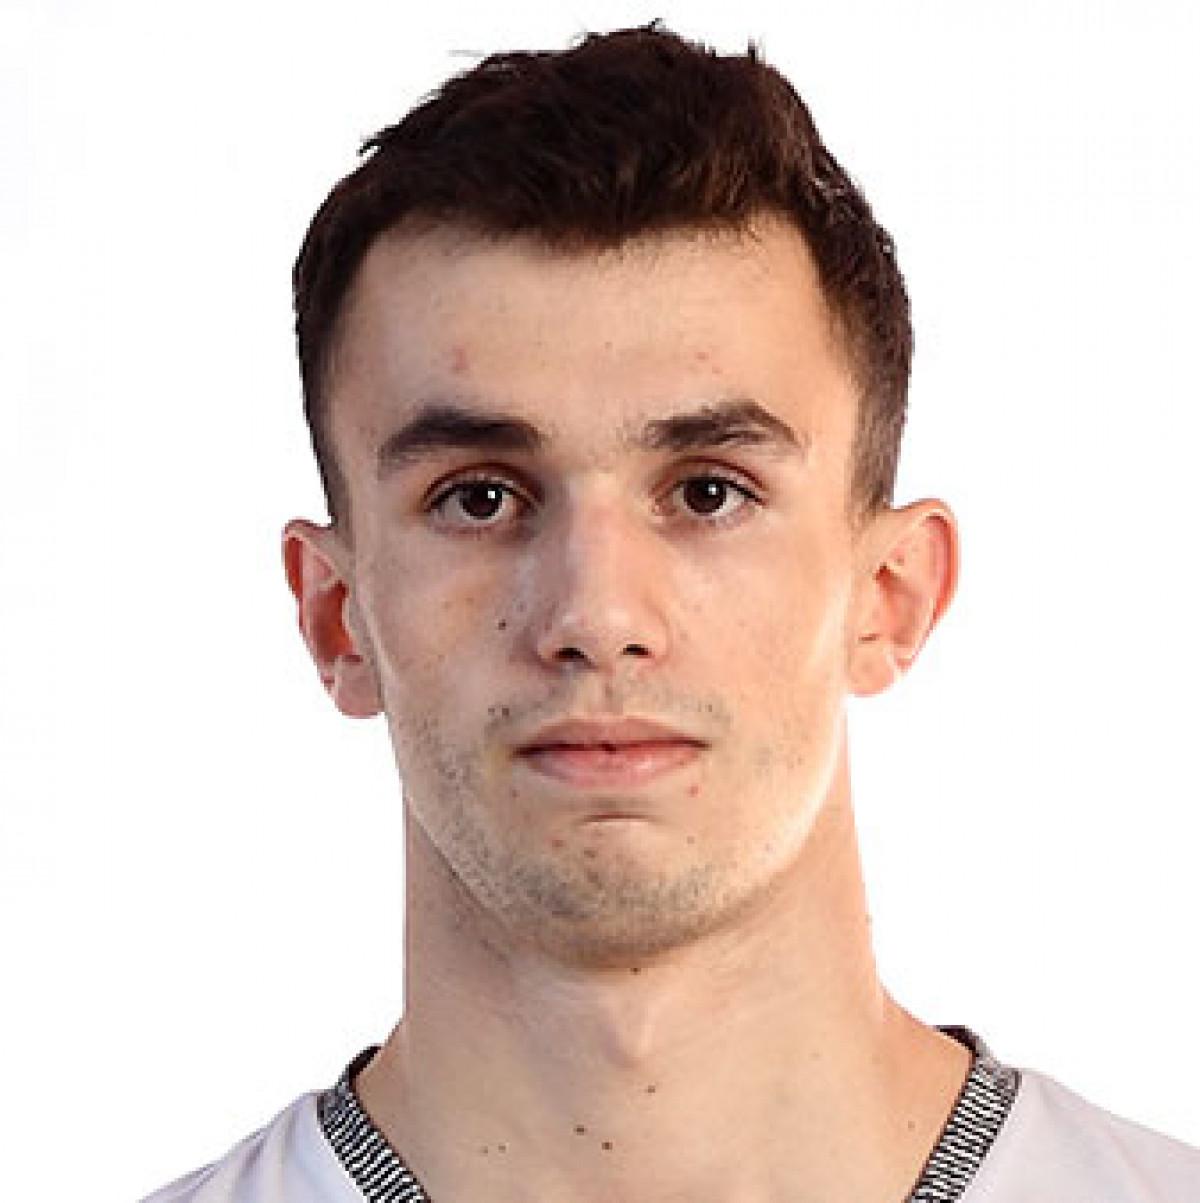 Dimitri Radnic